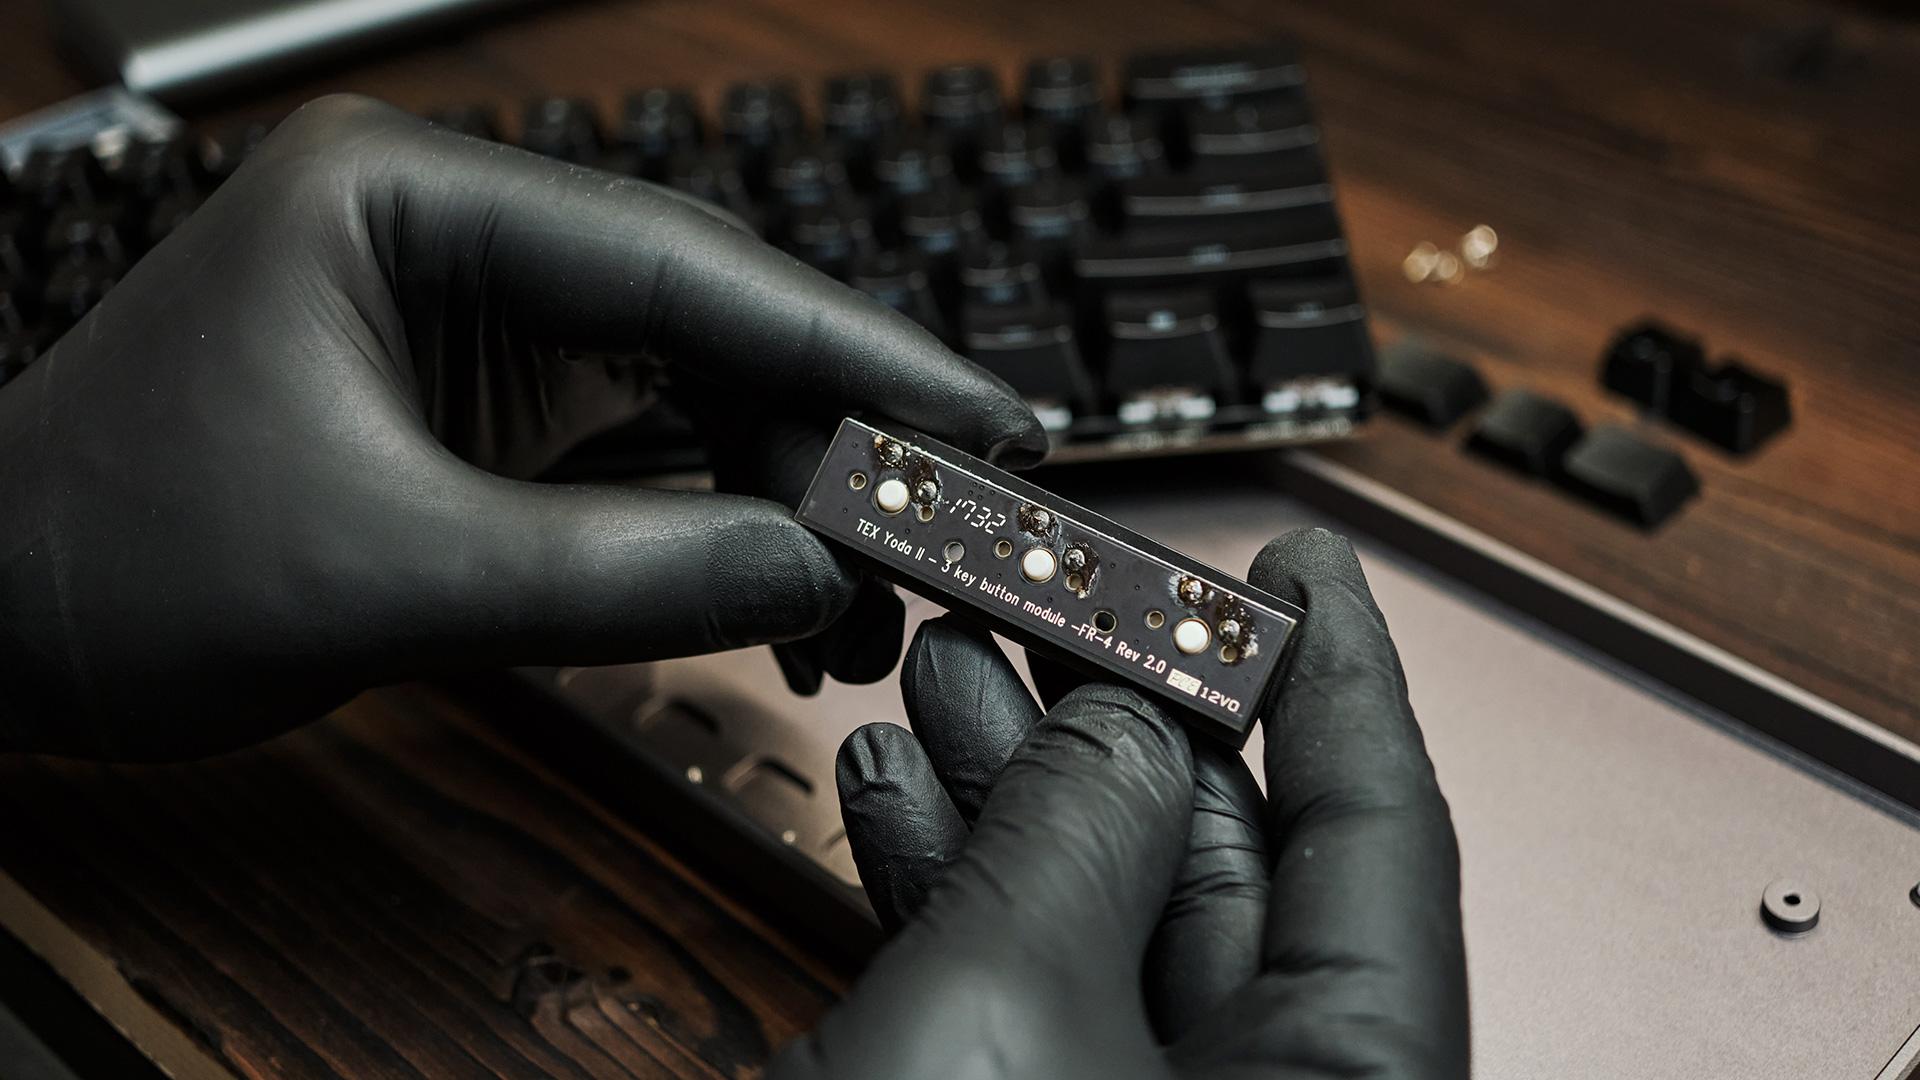 РазбираемTEX YODA II - модуль на 3 свитча